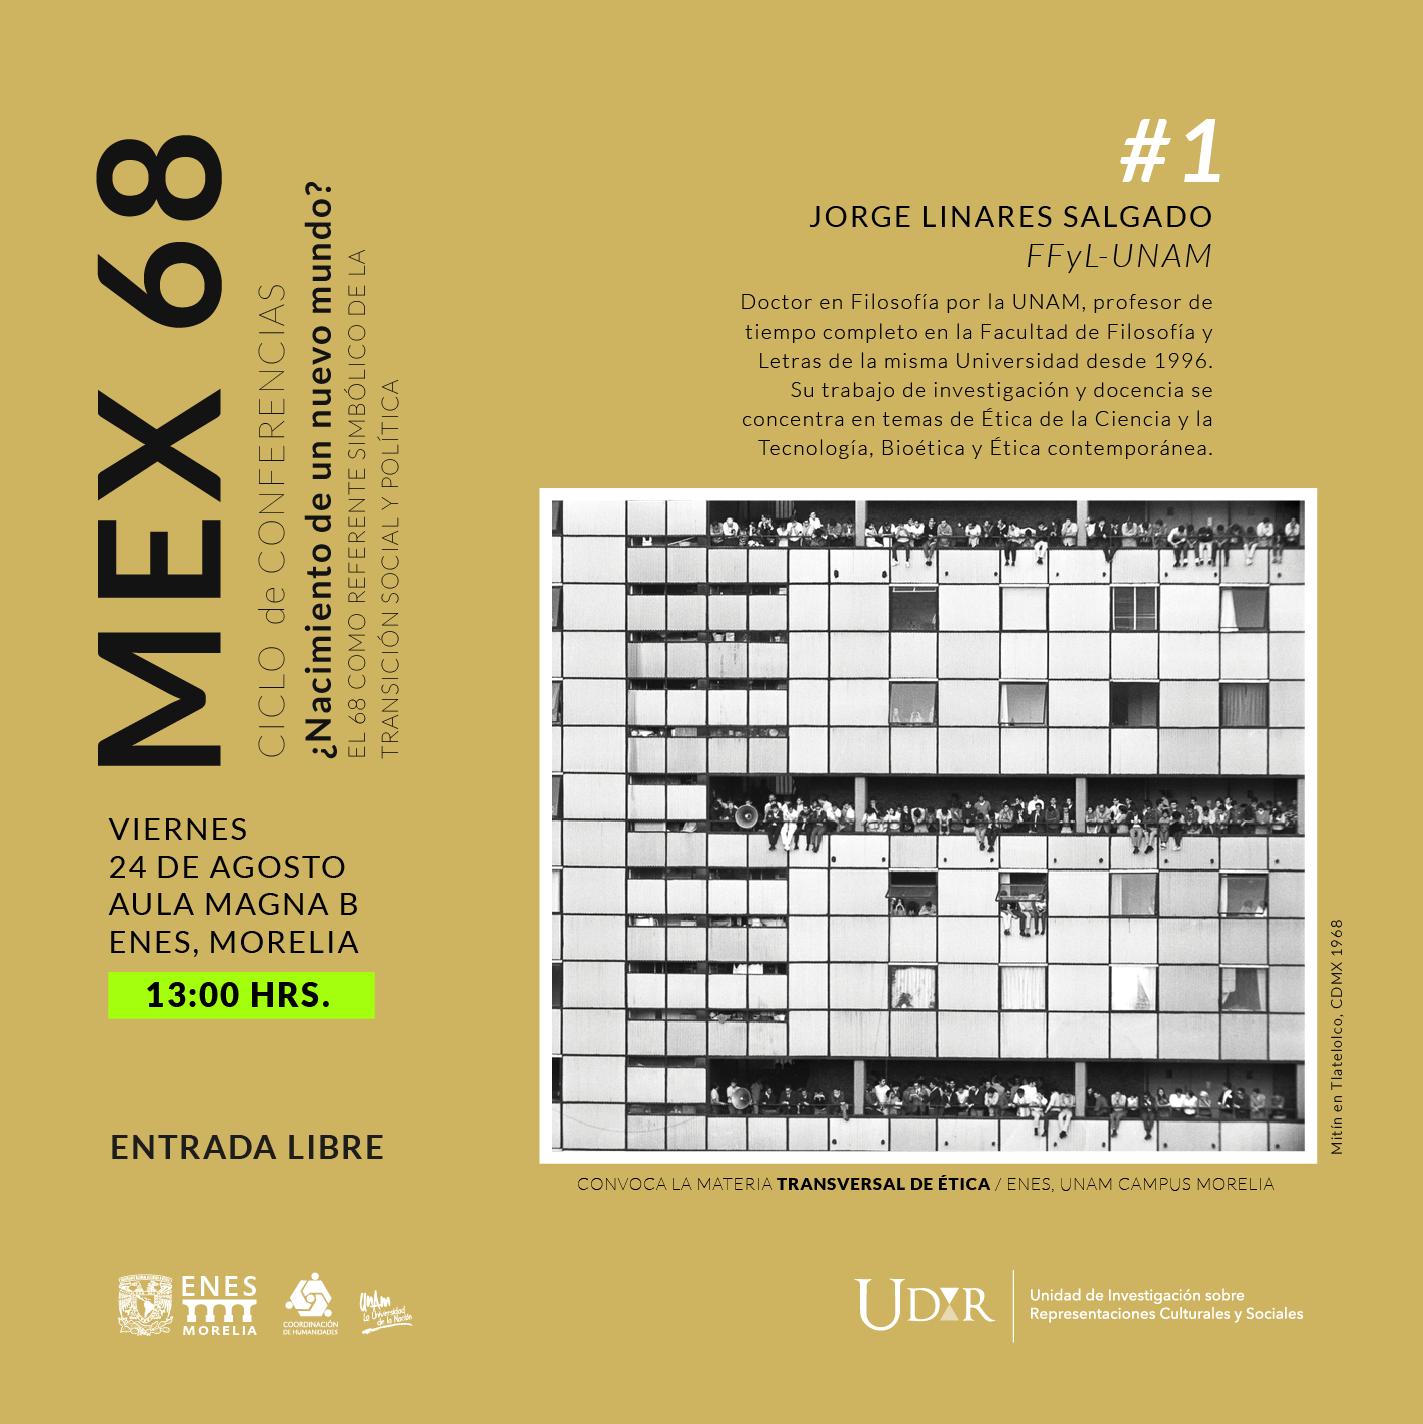 MEX68-01